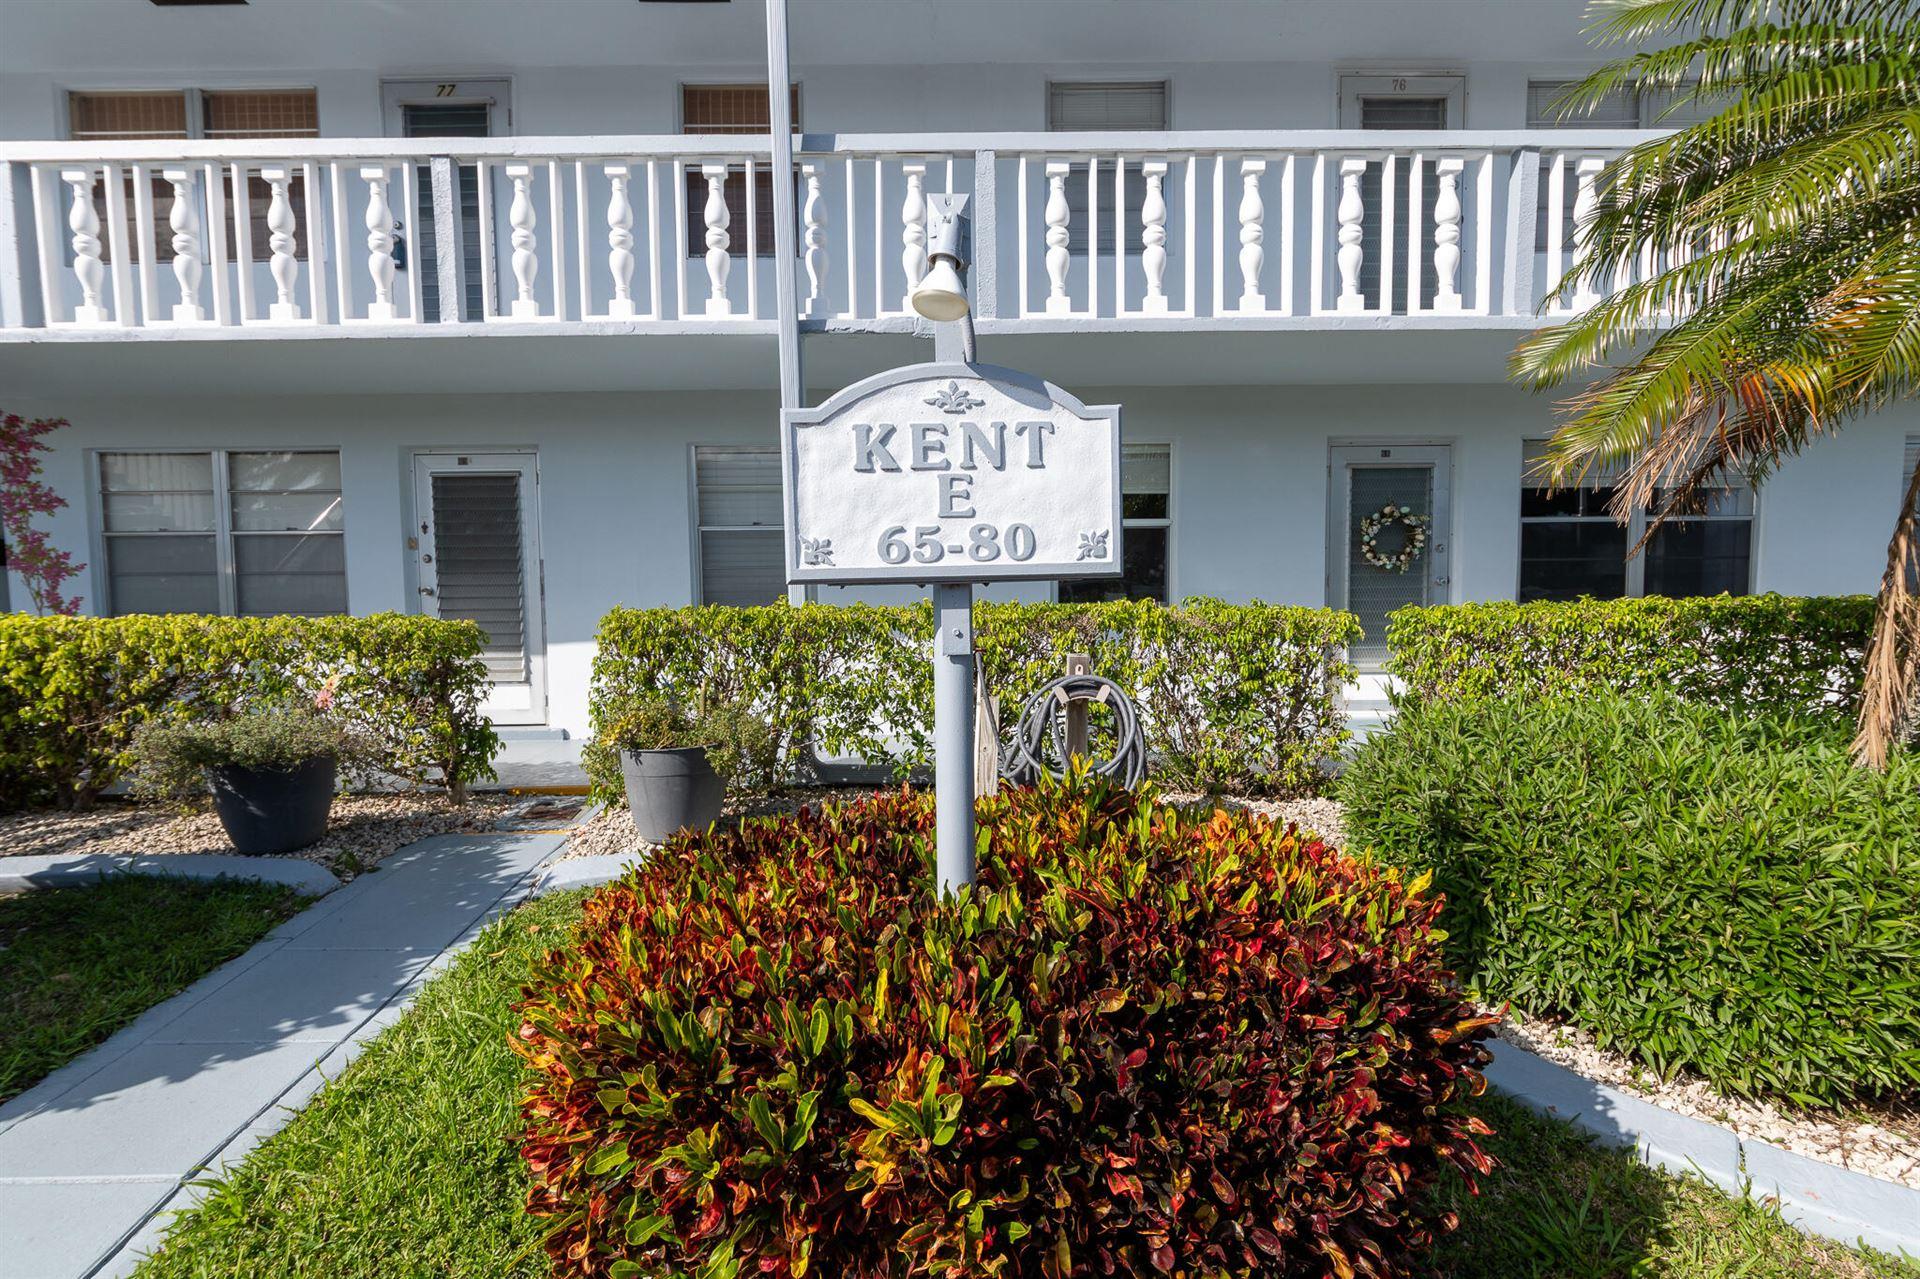 77 Kent E, West Palm Beach, FL 33417 - MLS#: RX-10700237